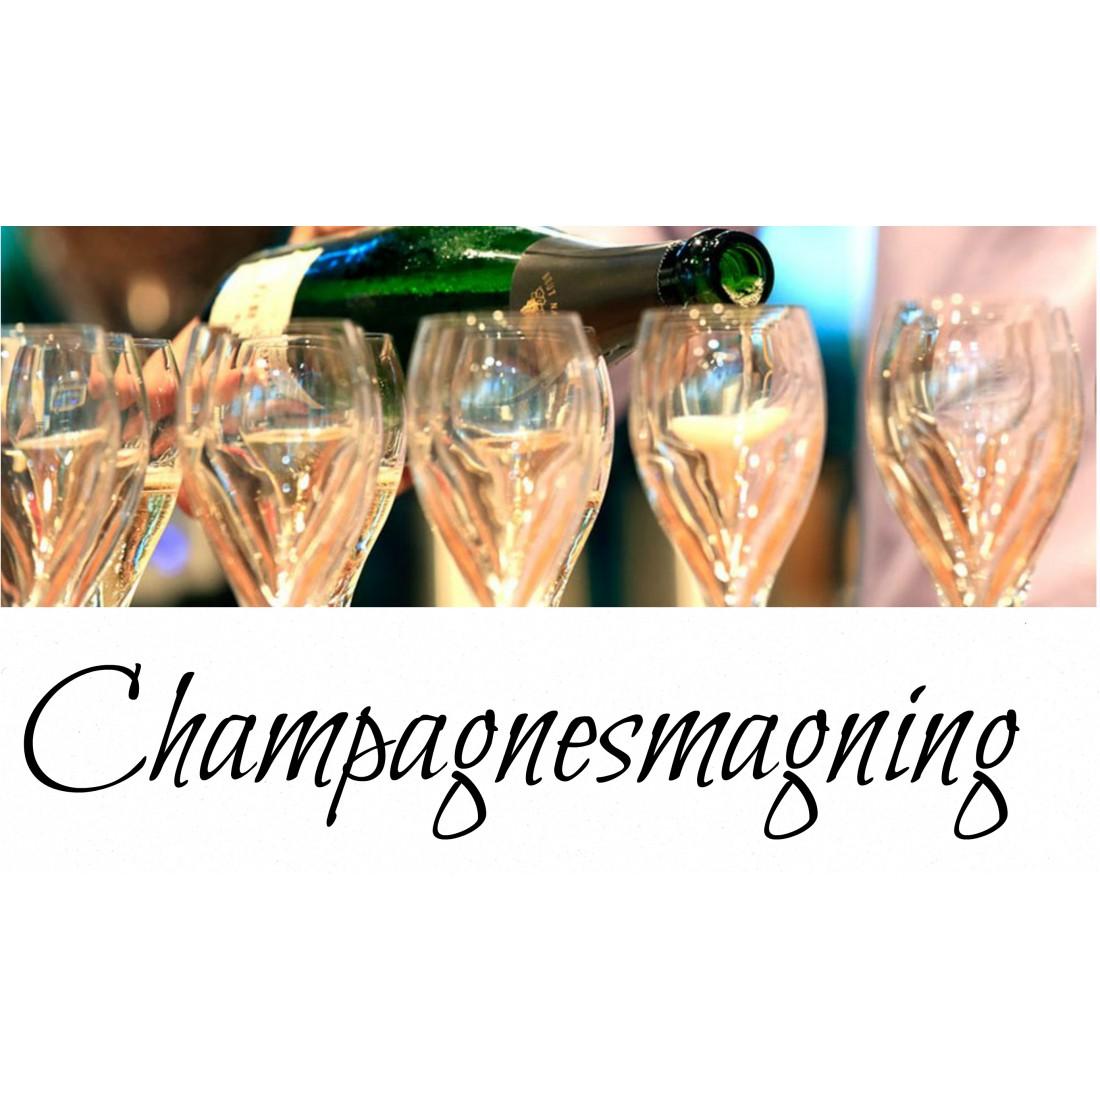 Champagnesmagninglrdagden19junikl1900hosSmagFrstirhus-31